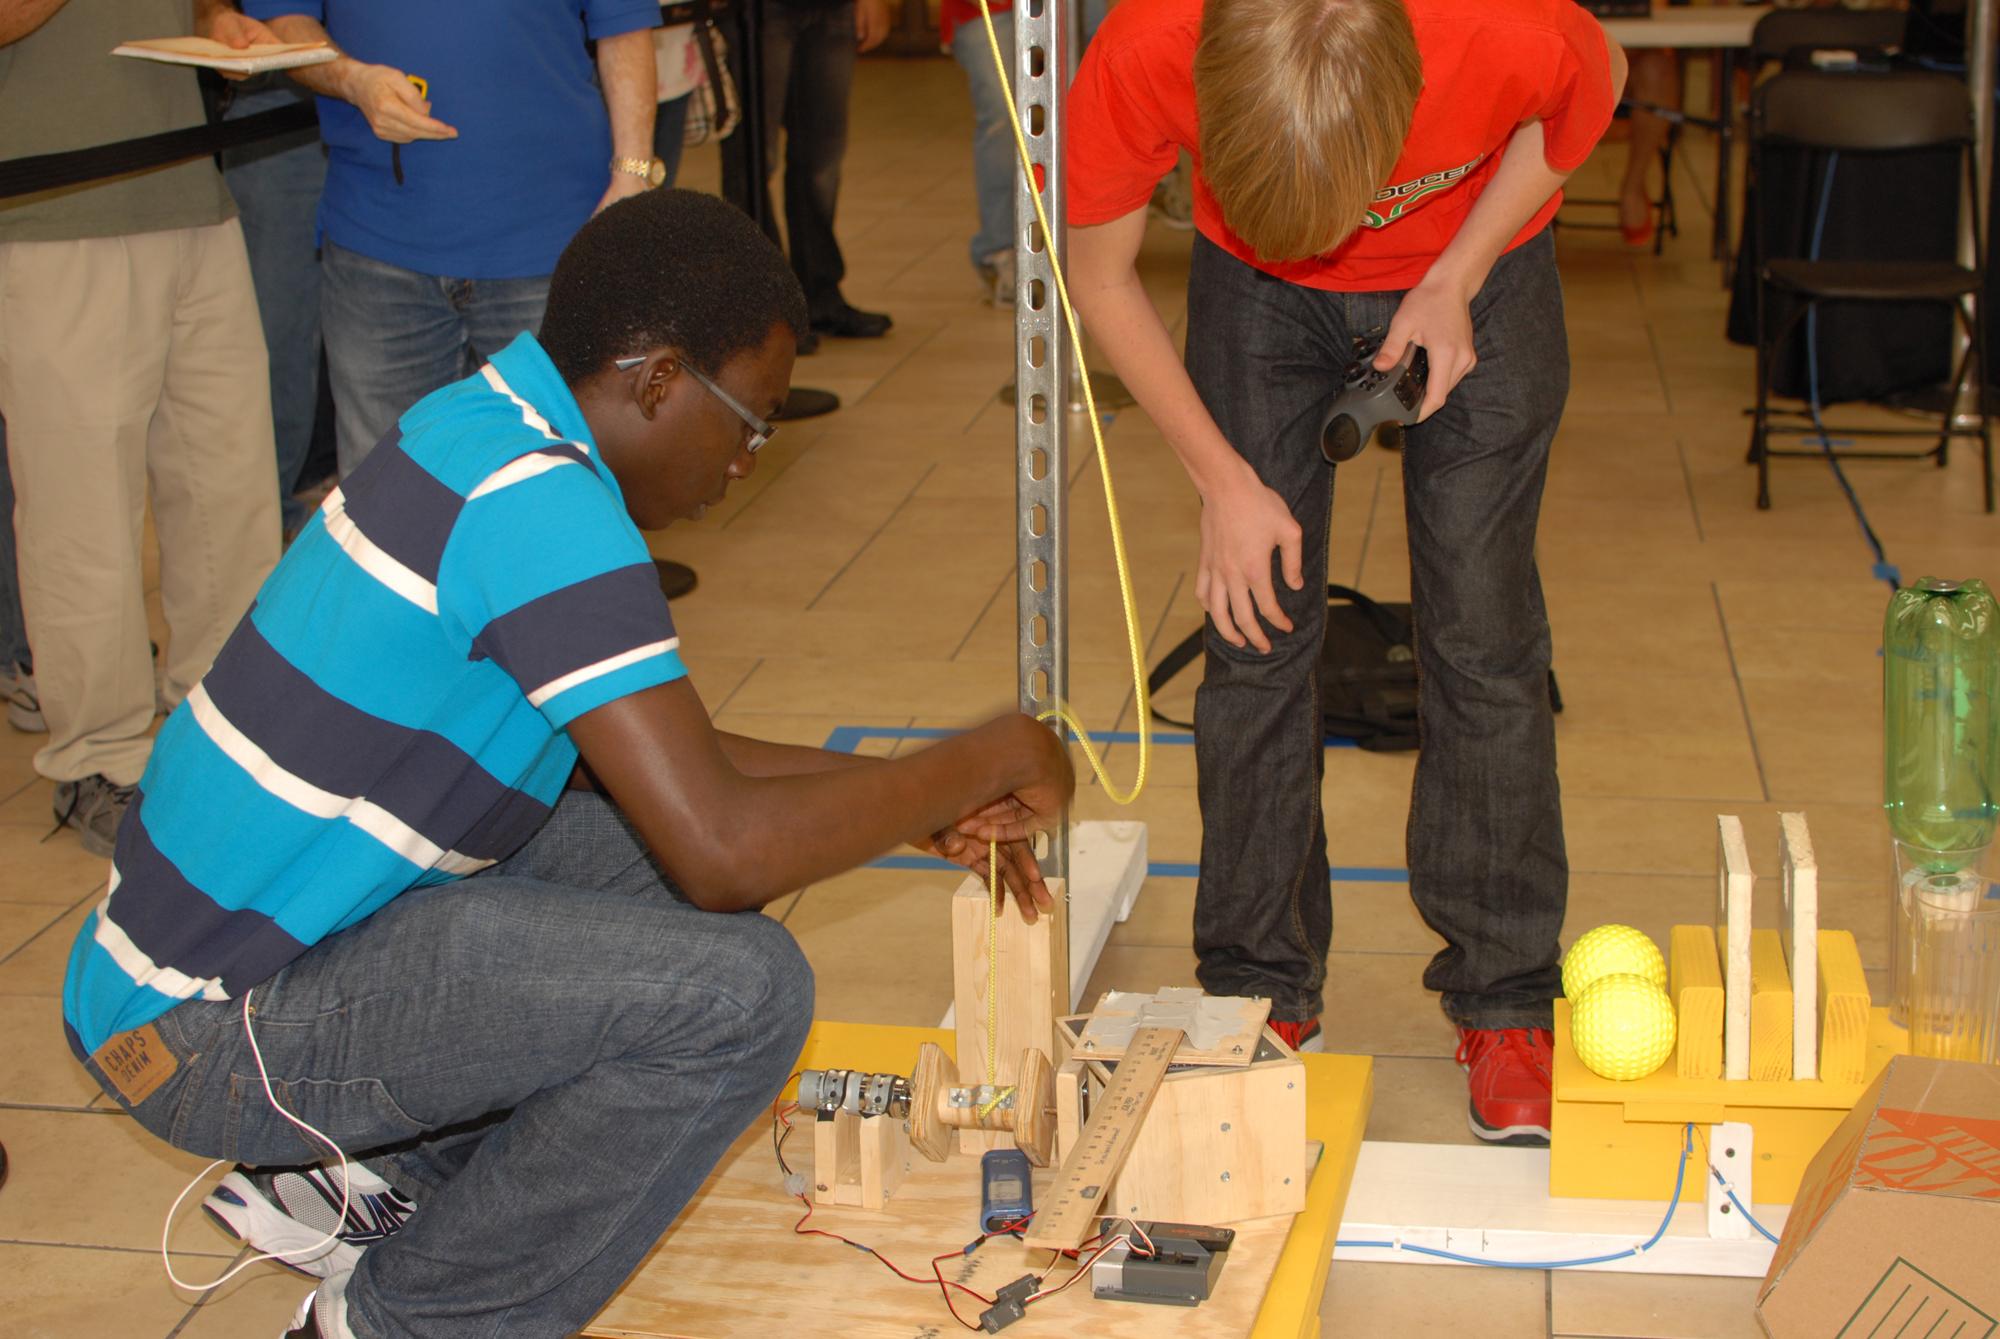 Demo Day 2012: High school robotics teams prepare for upcoming competition